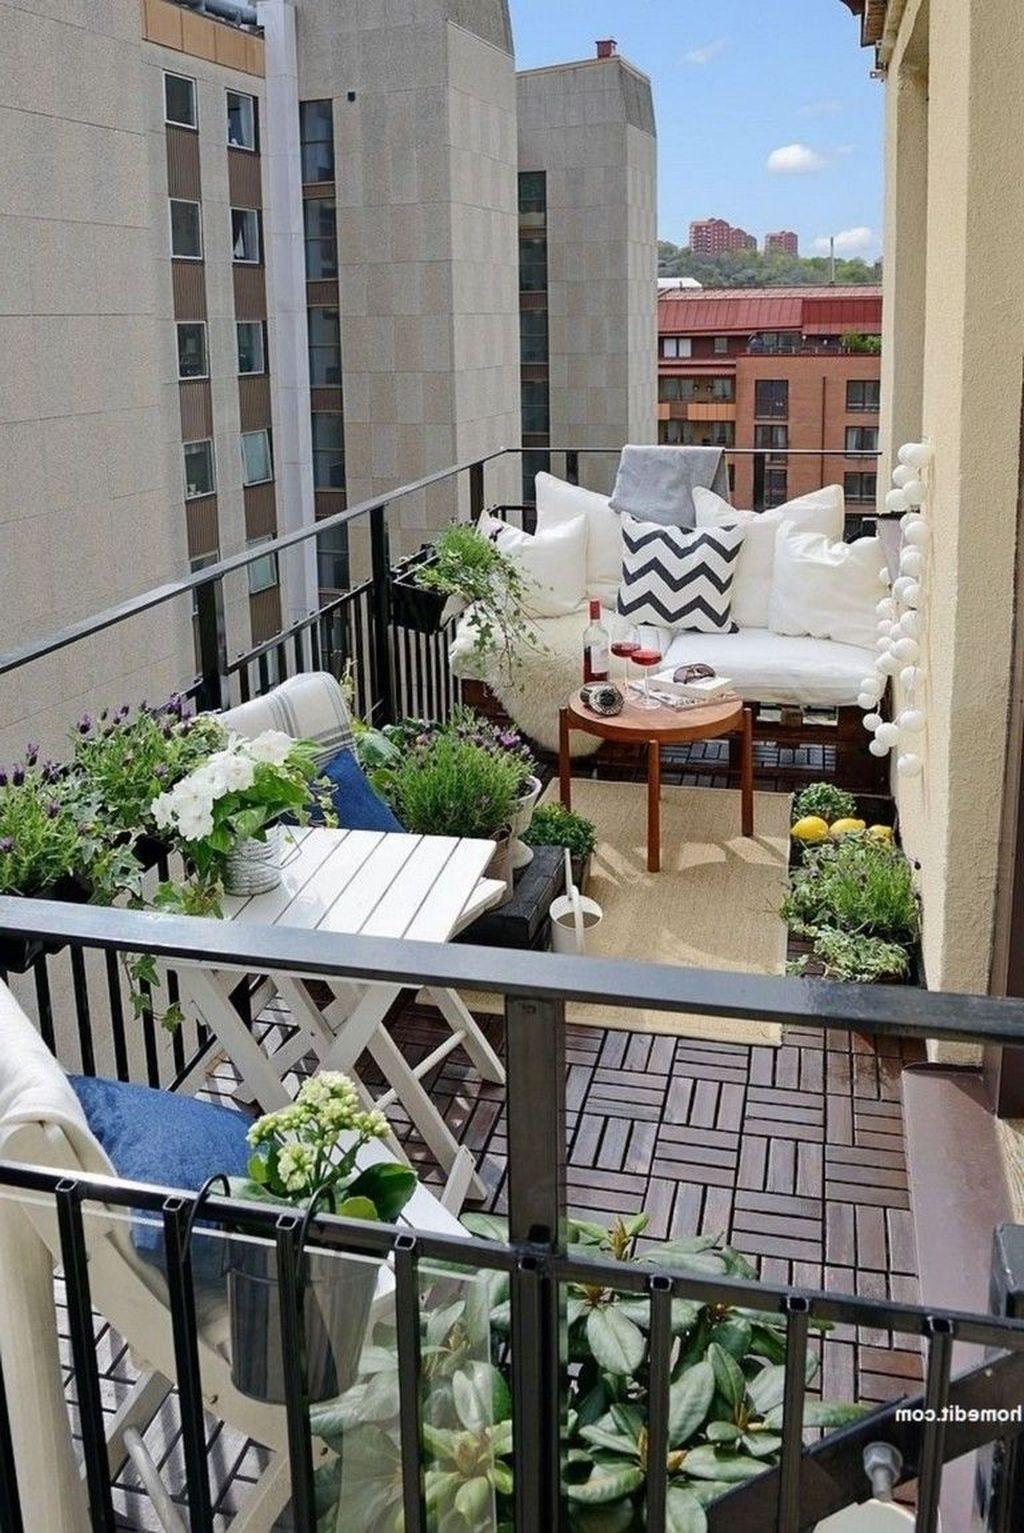 50 Modern Apartment Balcony Decorating Ideas on a Budget - TREND4HOMY